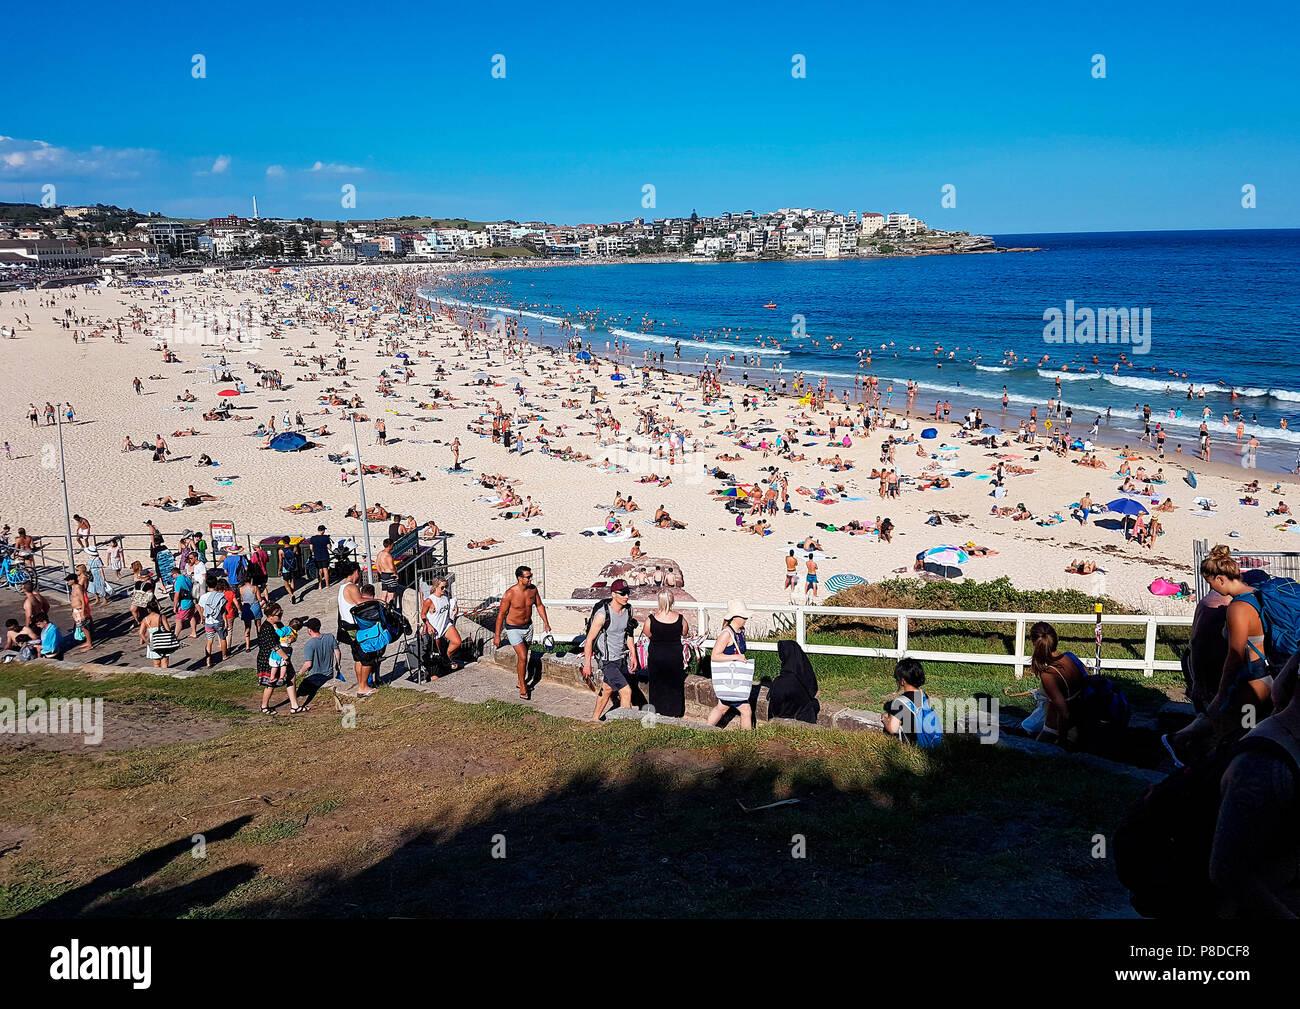 Impressionen: Bondi Beach, Sydney, Australien. - Stock Image